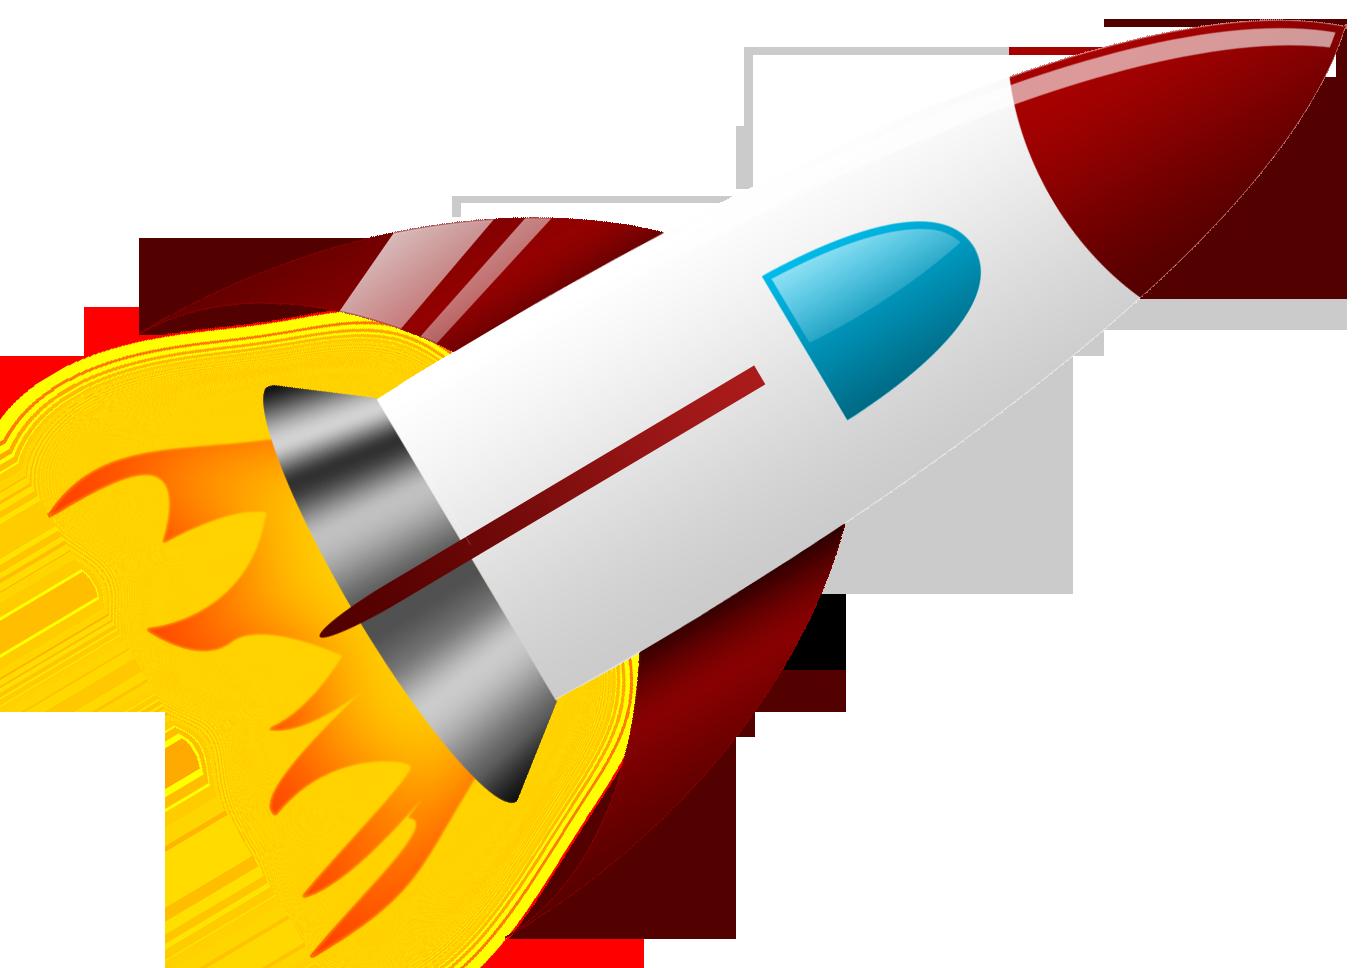 clipart rocket png image purepng free transparent cc0 Fire Truck Drawing Basic Fire Truck Clip Art